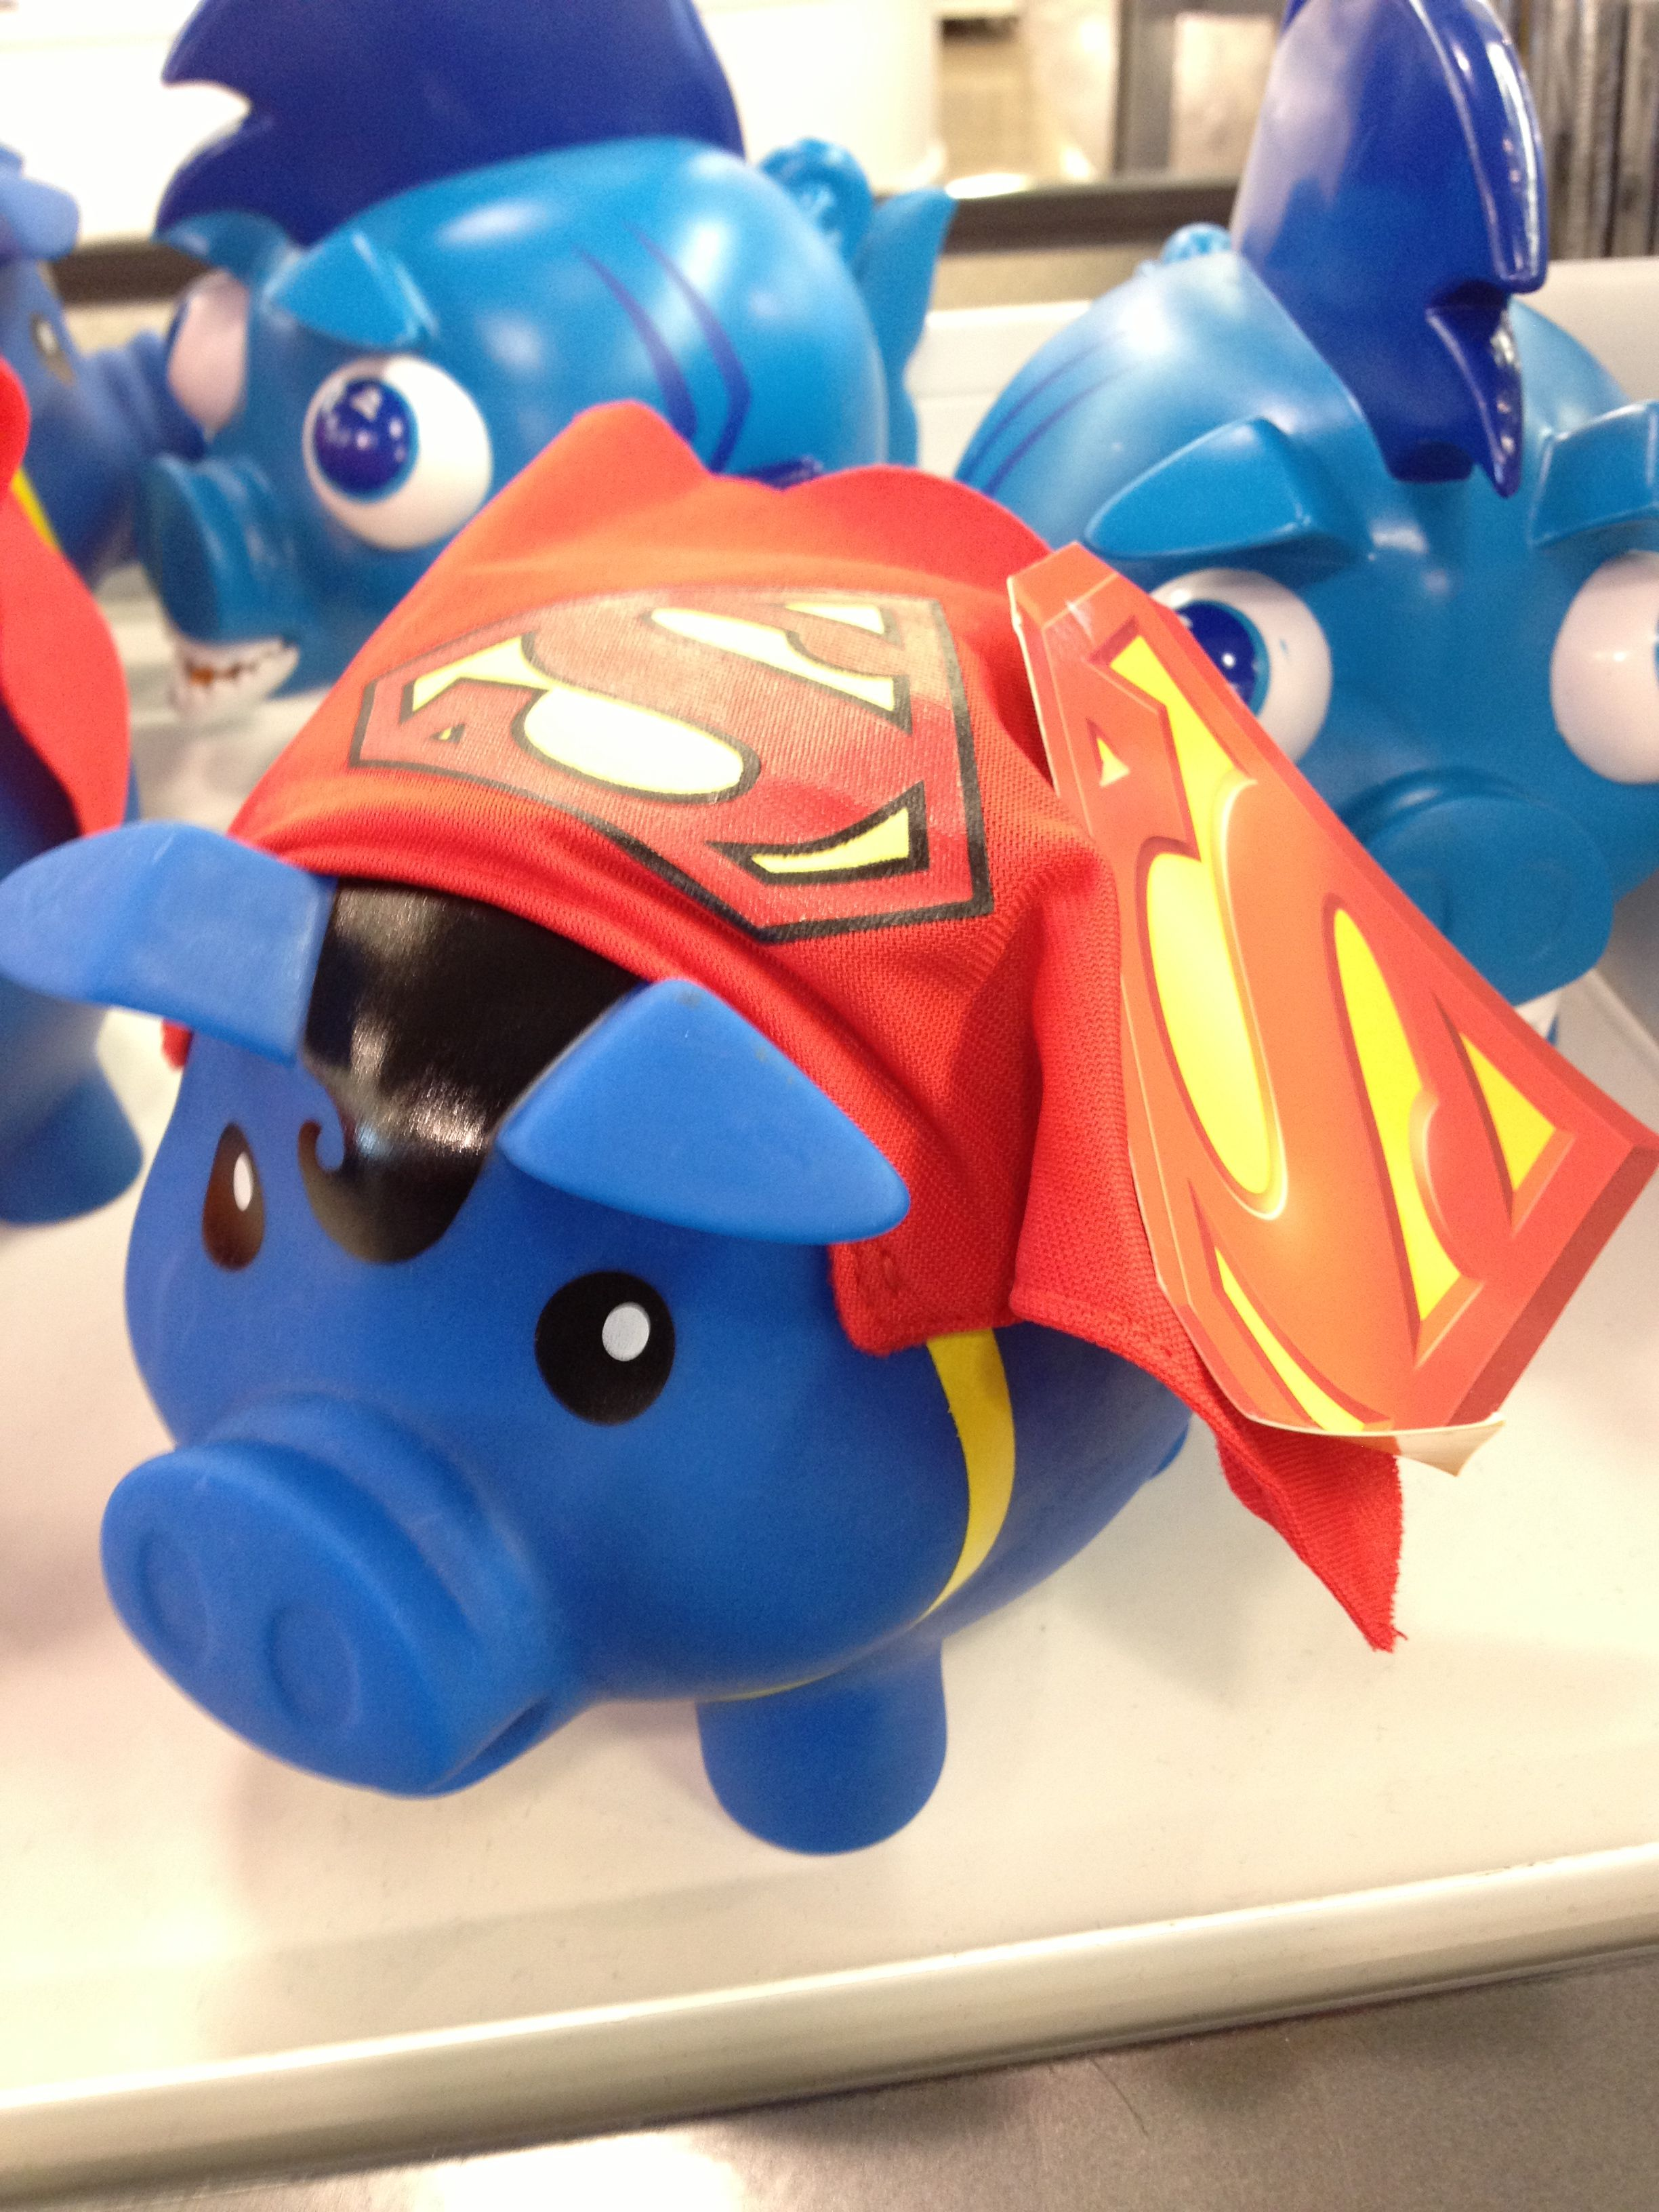 Superflex Piggy Bank Found At Old Navy Reinforce Good Social Thinking Skills